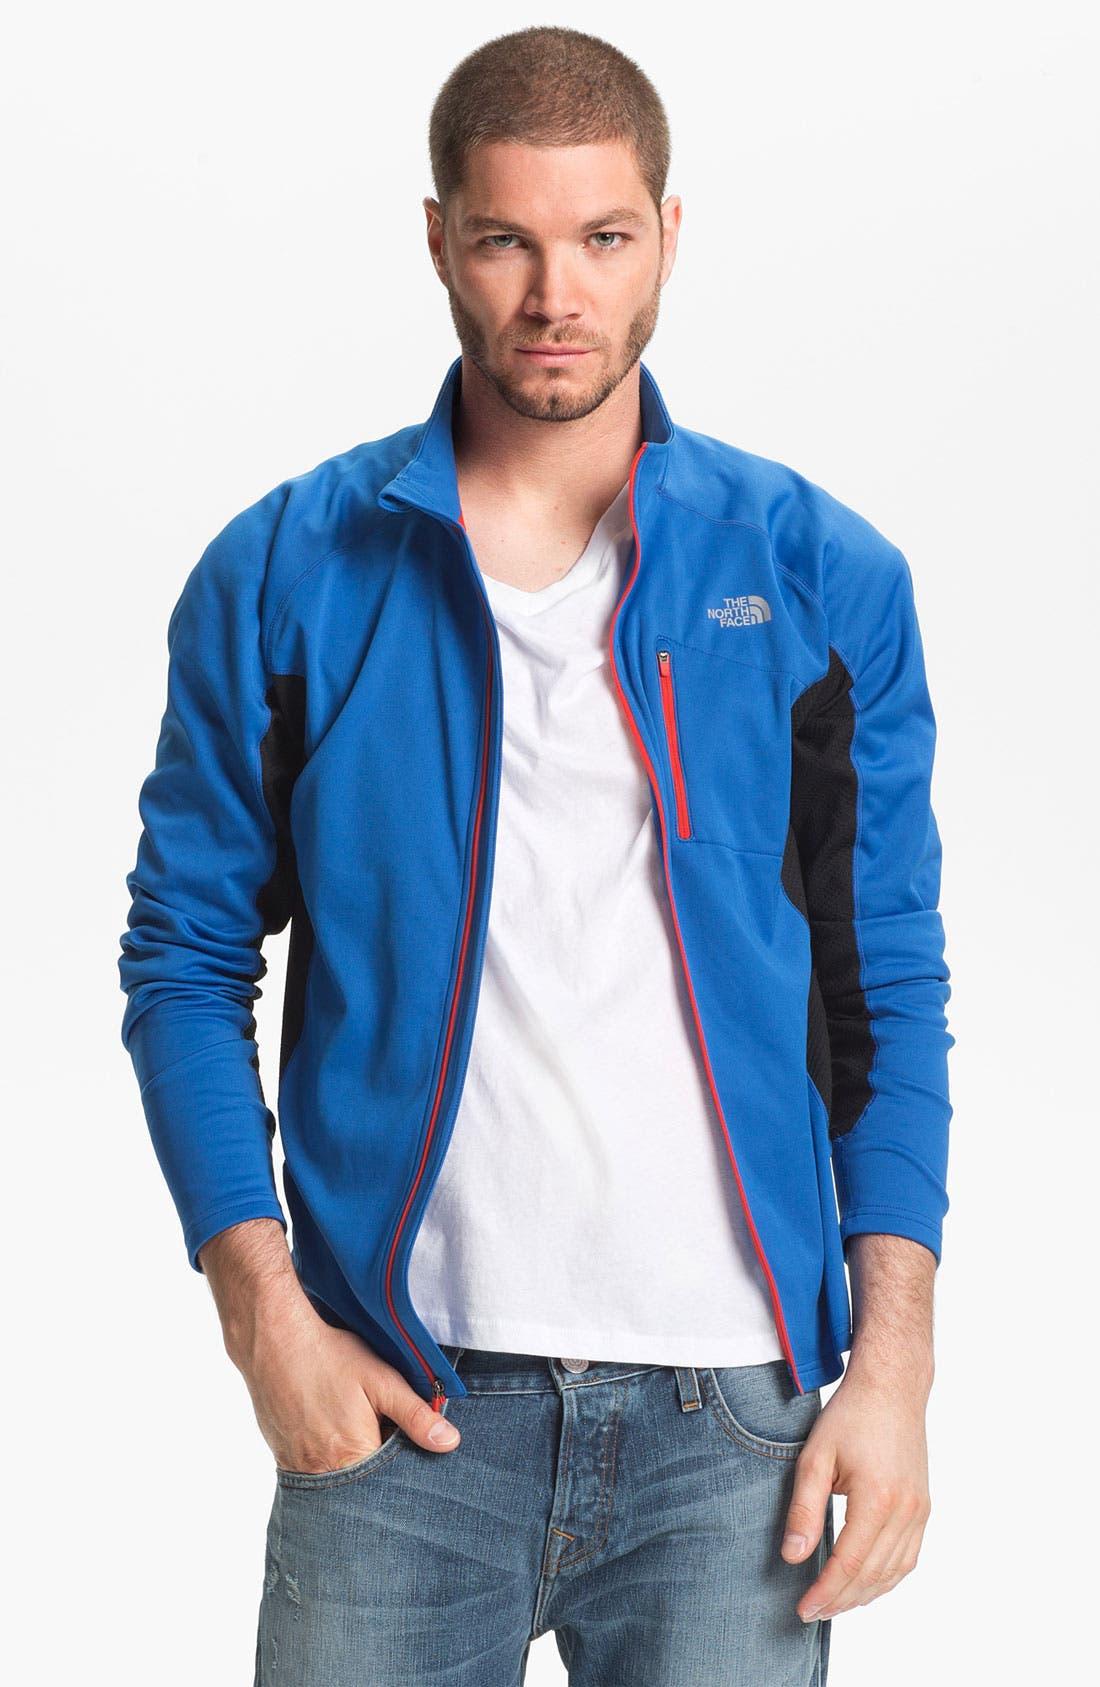 Alternate Image 1 Selected - The North Face 'Teocalli' Hybrid Fleece Jacket